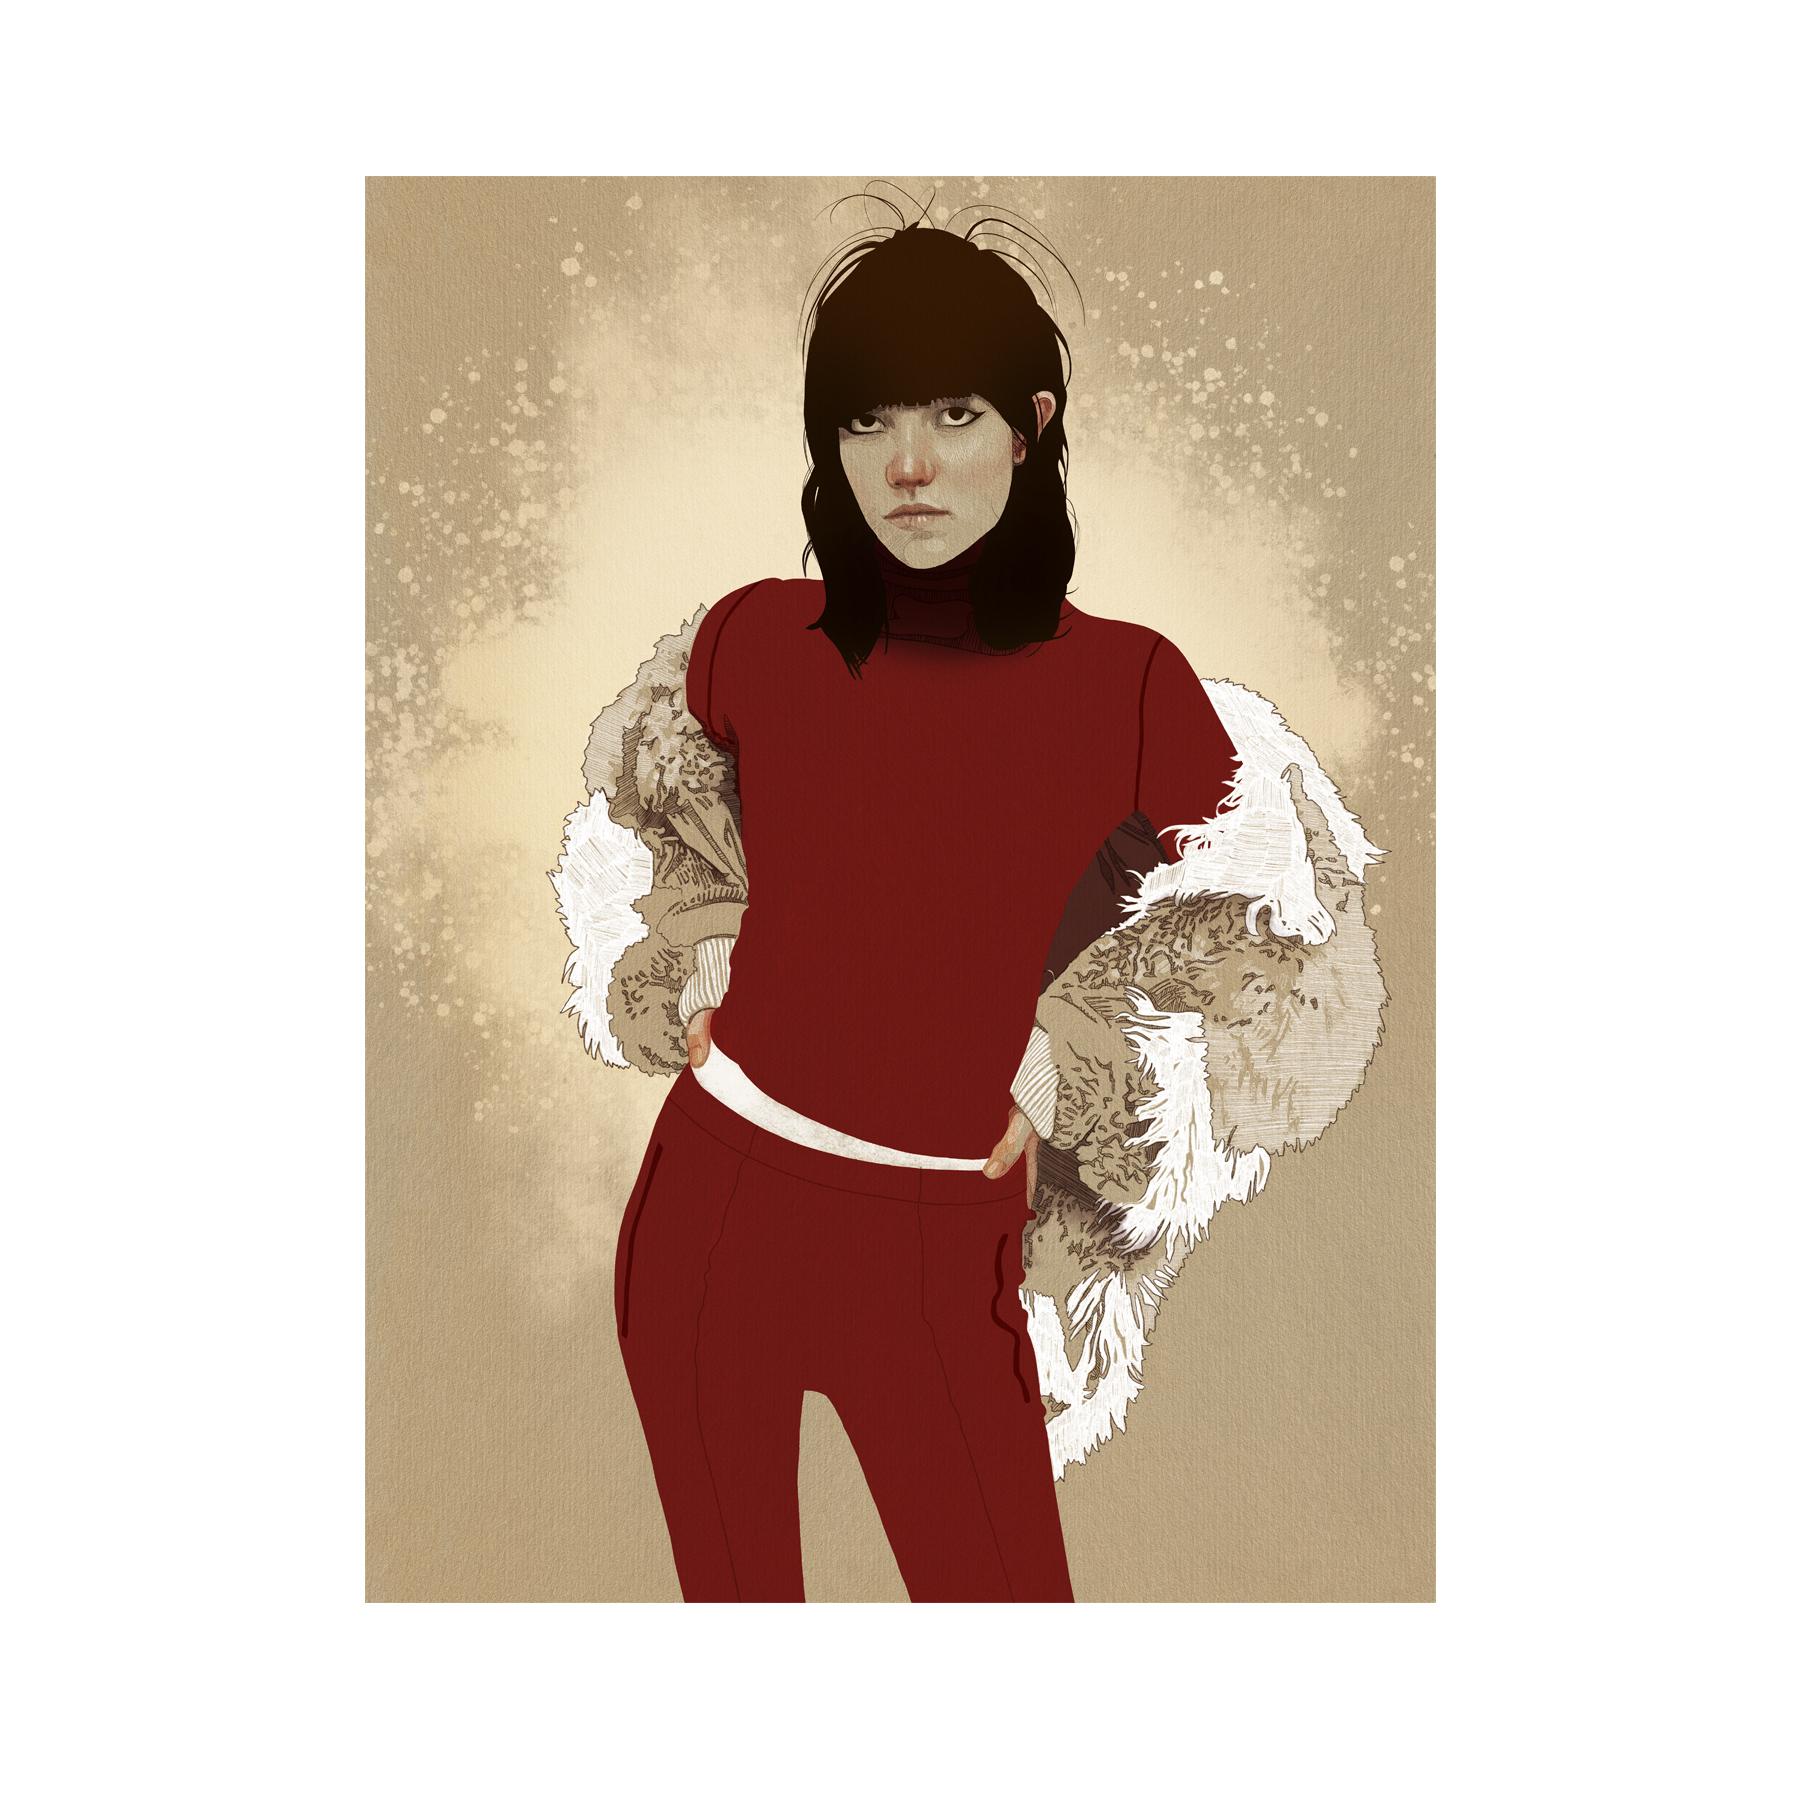 Red_Fashion Illustration_Digital Art_Pro